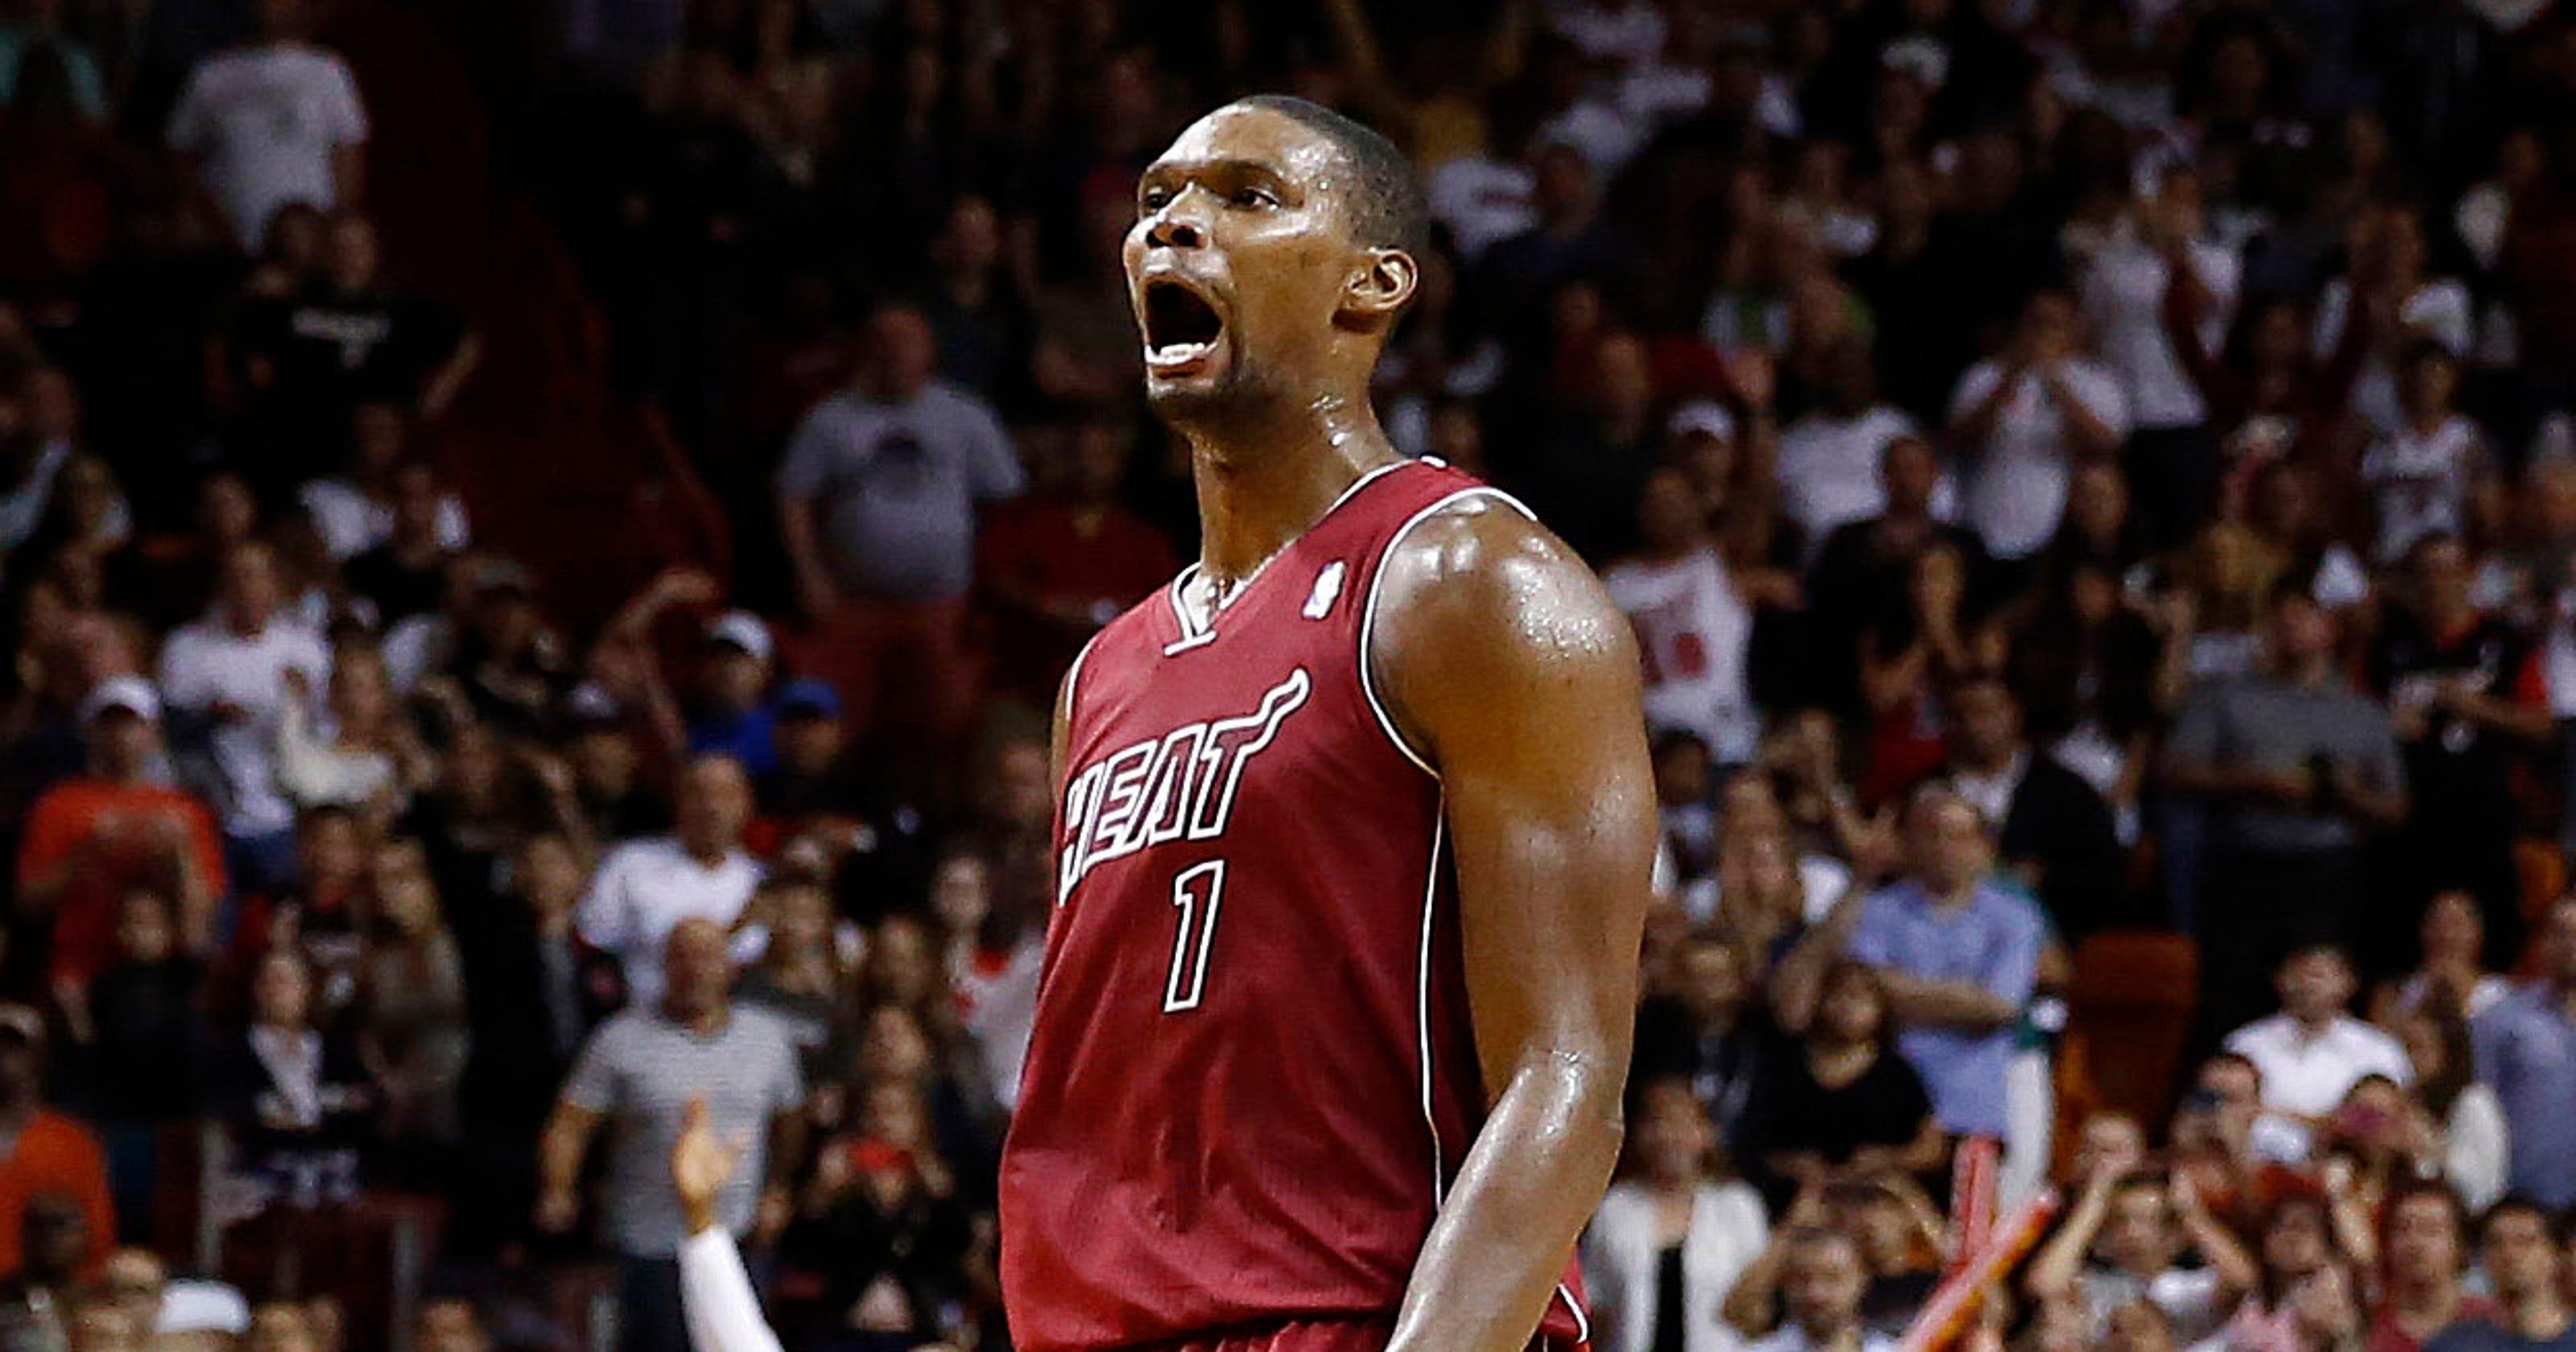 1a6d0c2eda08 Chris Bosh s late heroics lift Heat past Bobcats